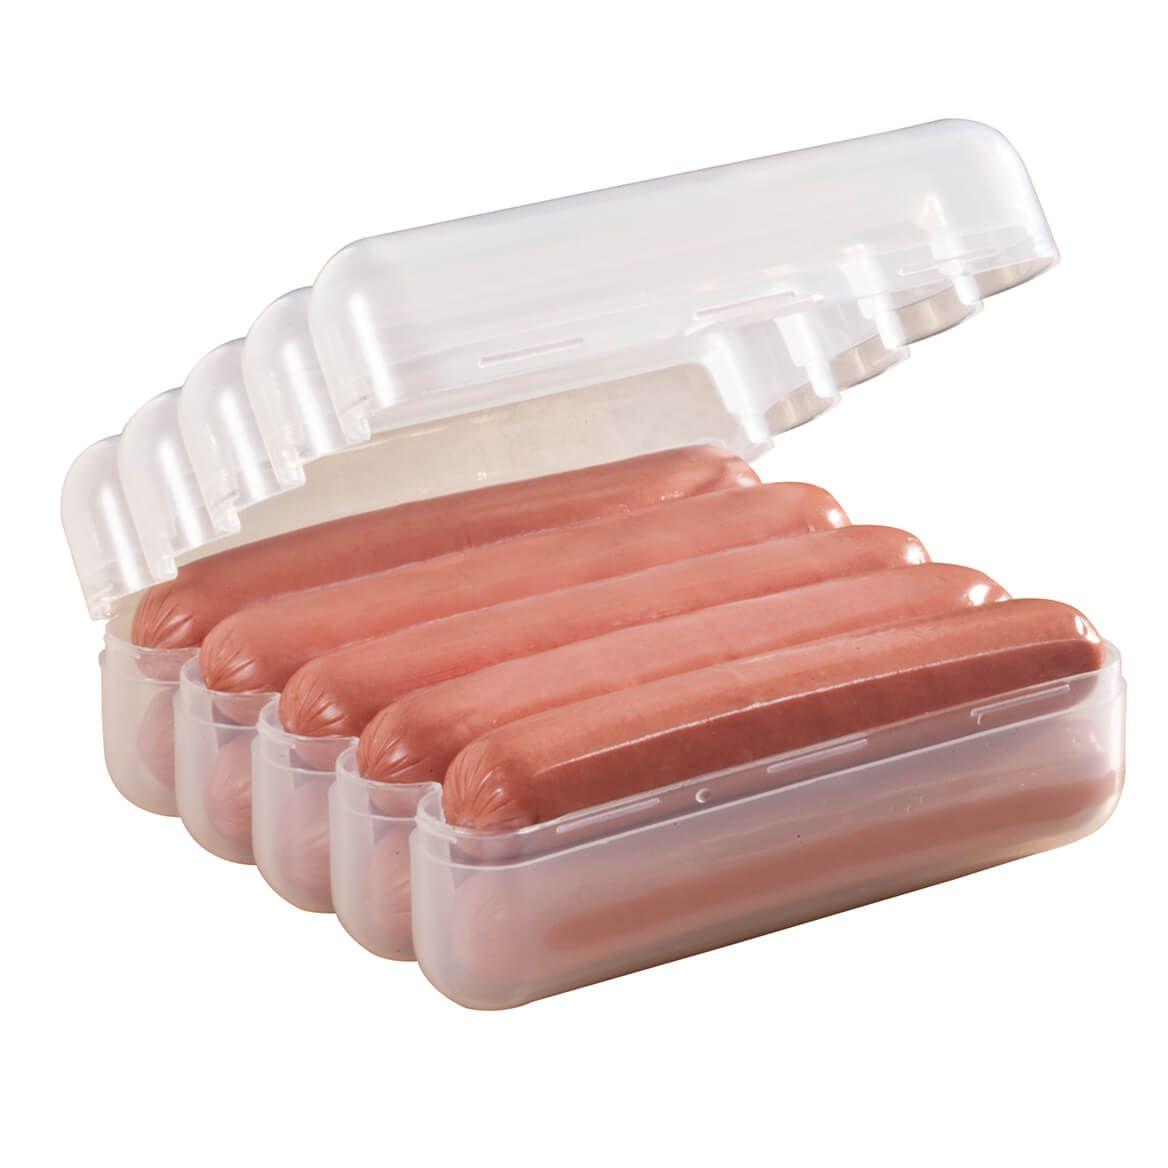 Hot Dog Keeper-352775